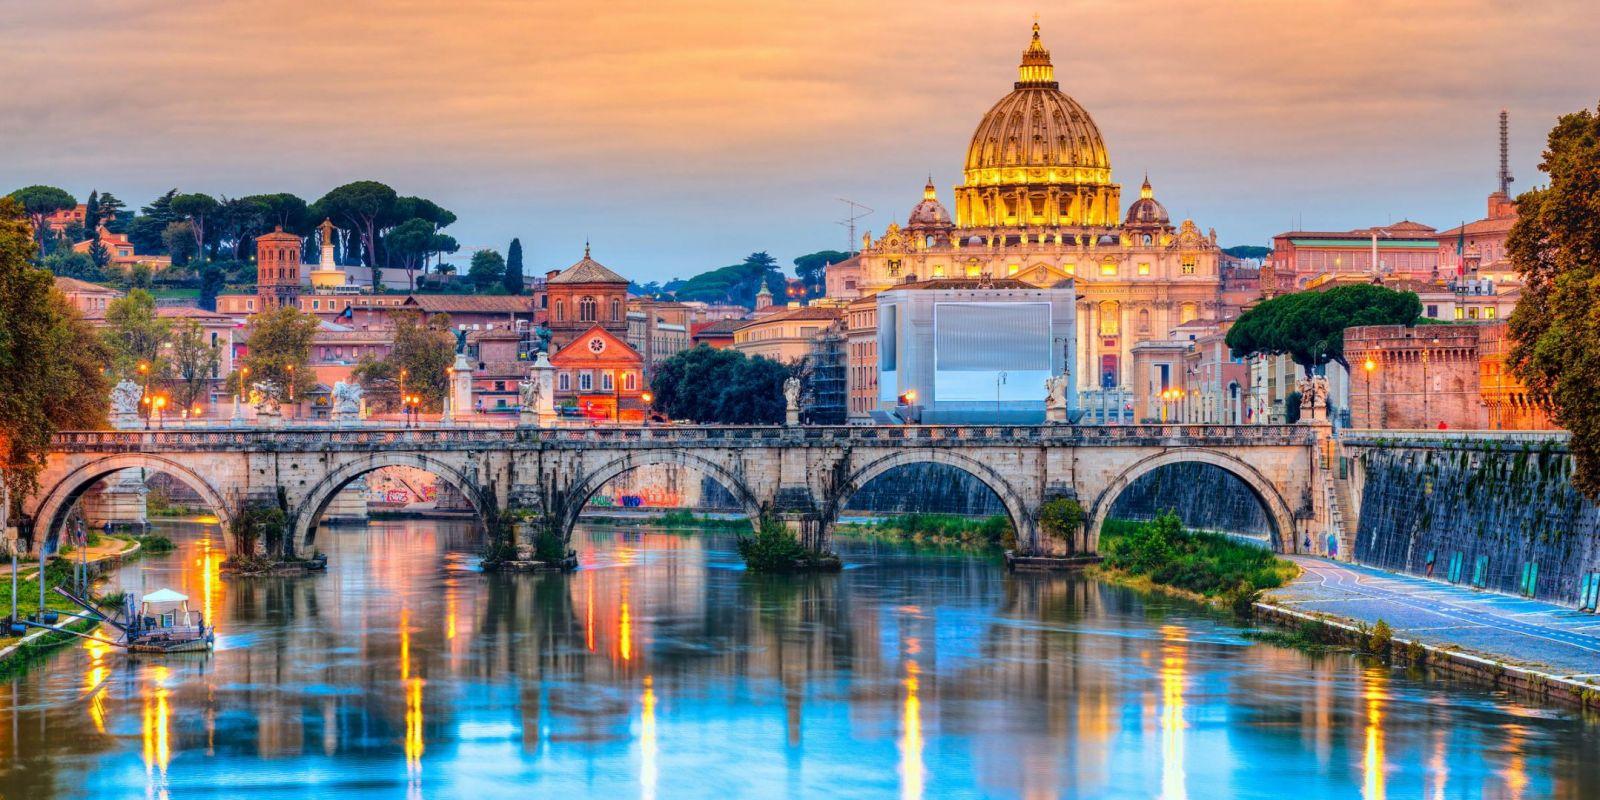 Bαλίτσες για Ρώμη ετοιμάζει ο δήμαρχος Αγρινίου